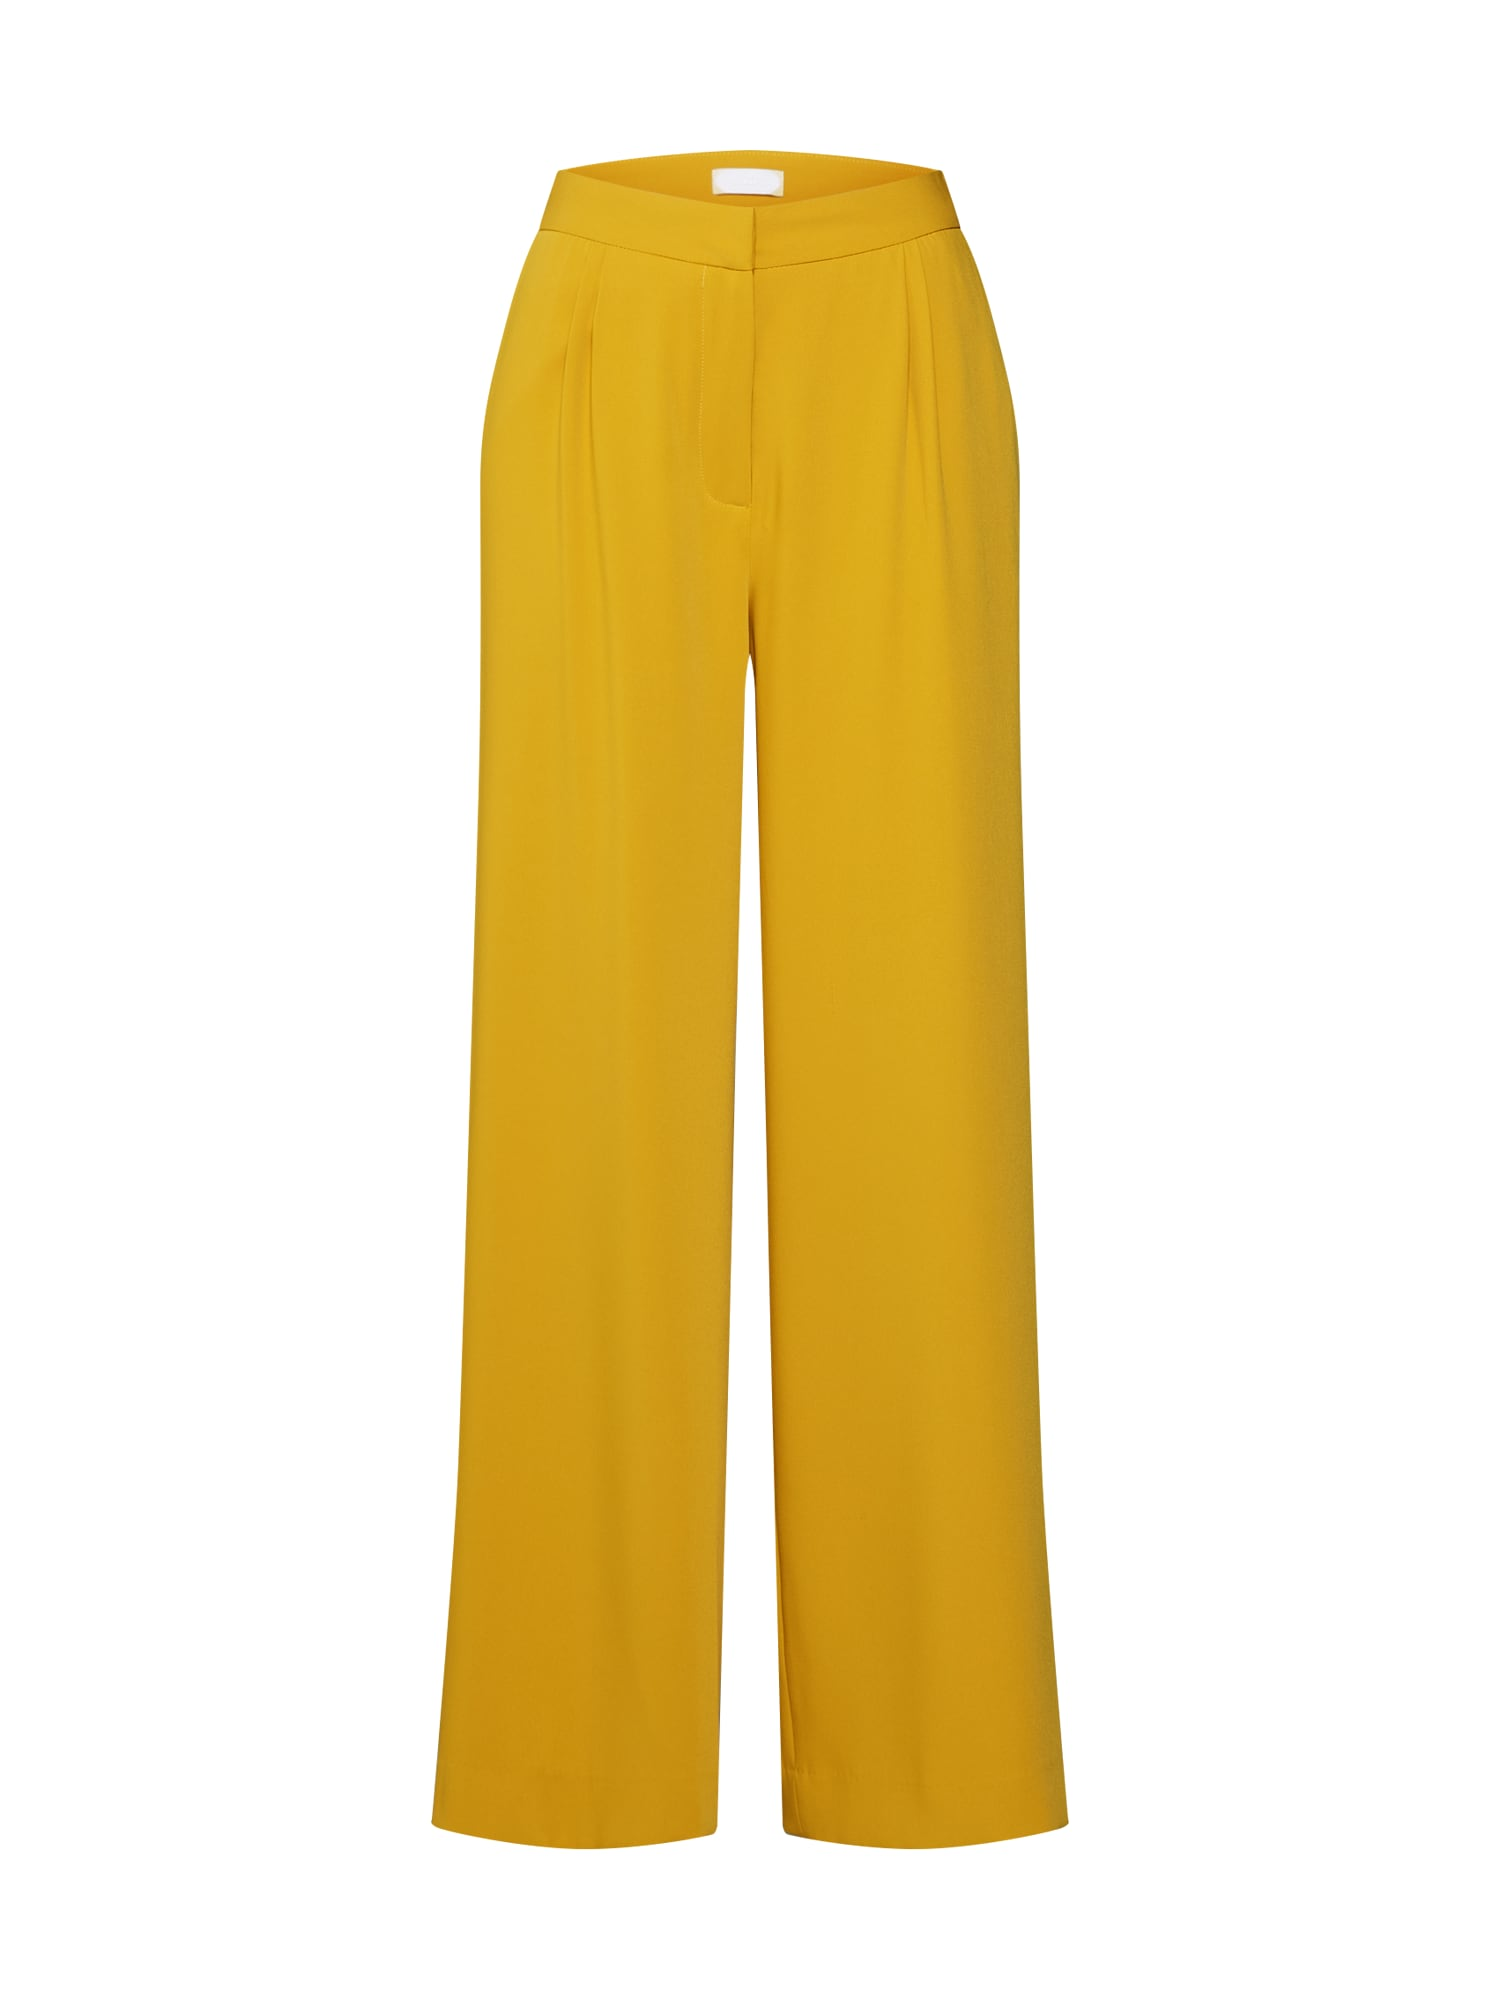 2NDDAY Klostuotos kelnės 'Megan' geltona